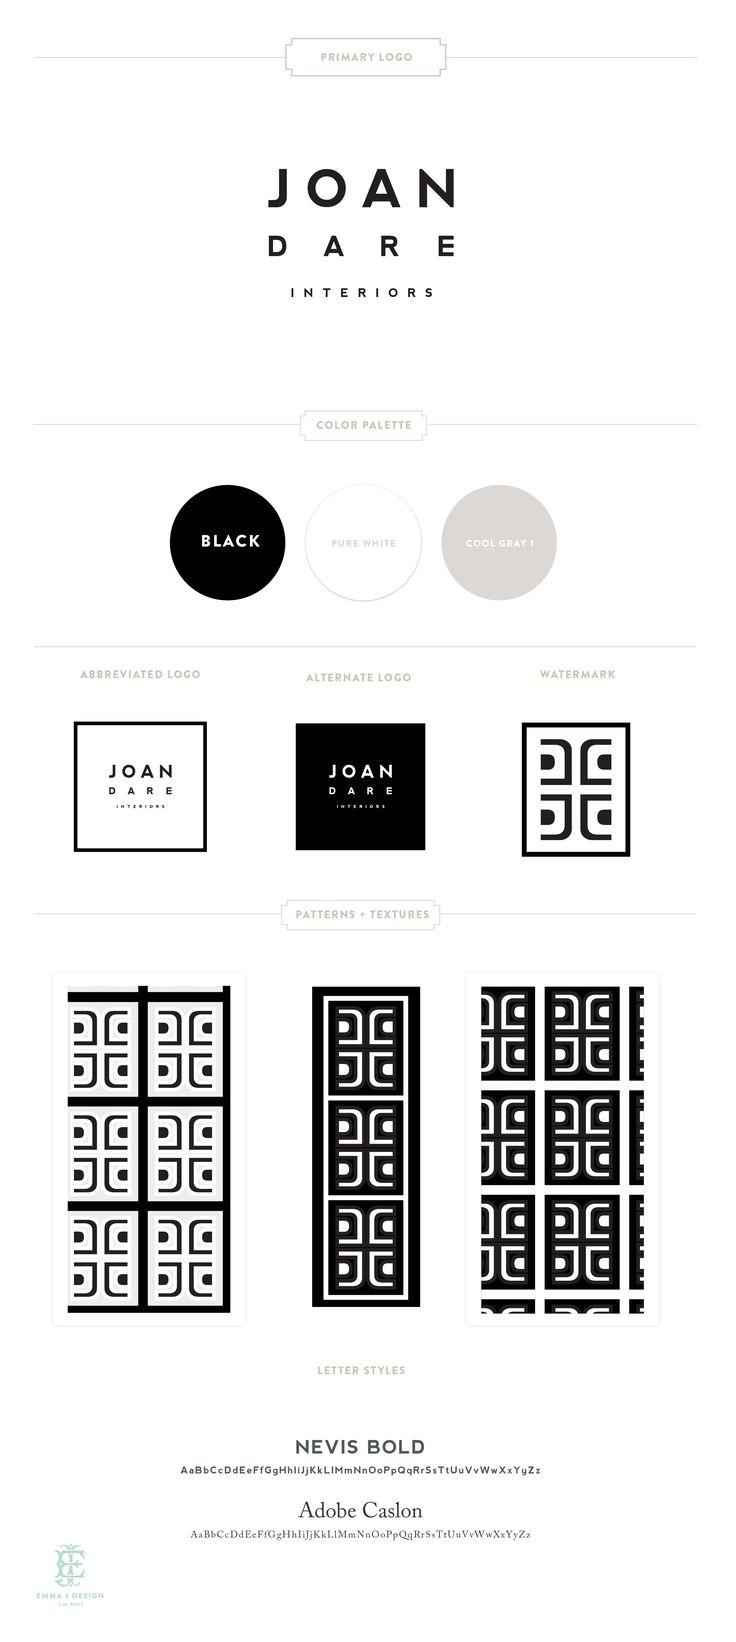 Branding Design for Joan Dare Interiors   Luxury Branding, Logo, Original Pattern Design   Interior Design Brand www.emilymccarthy.com